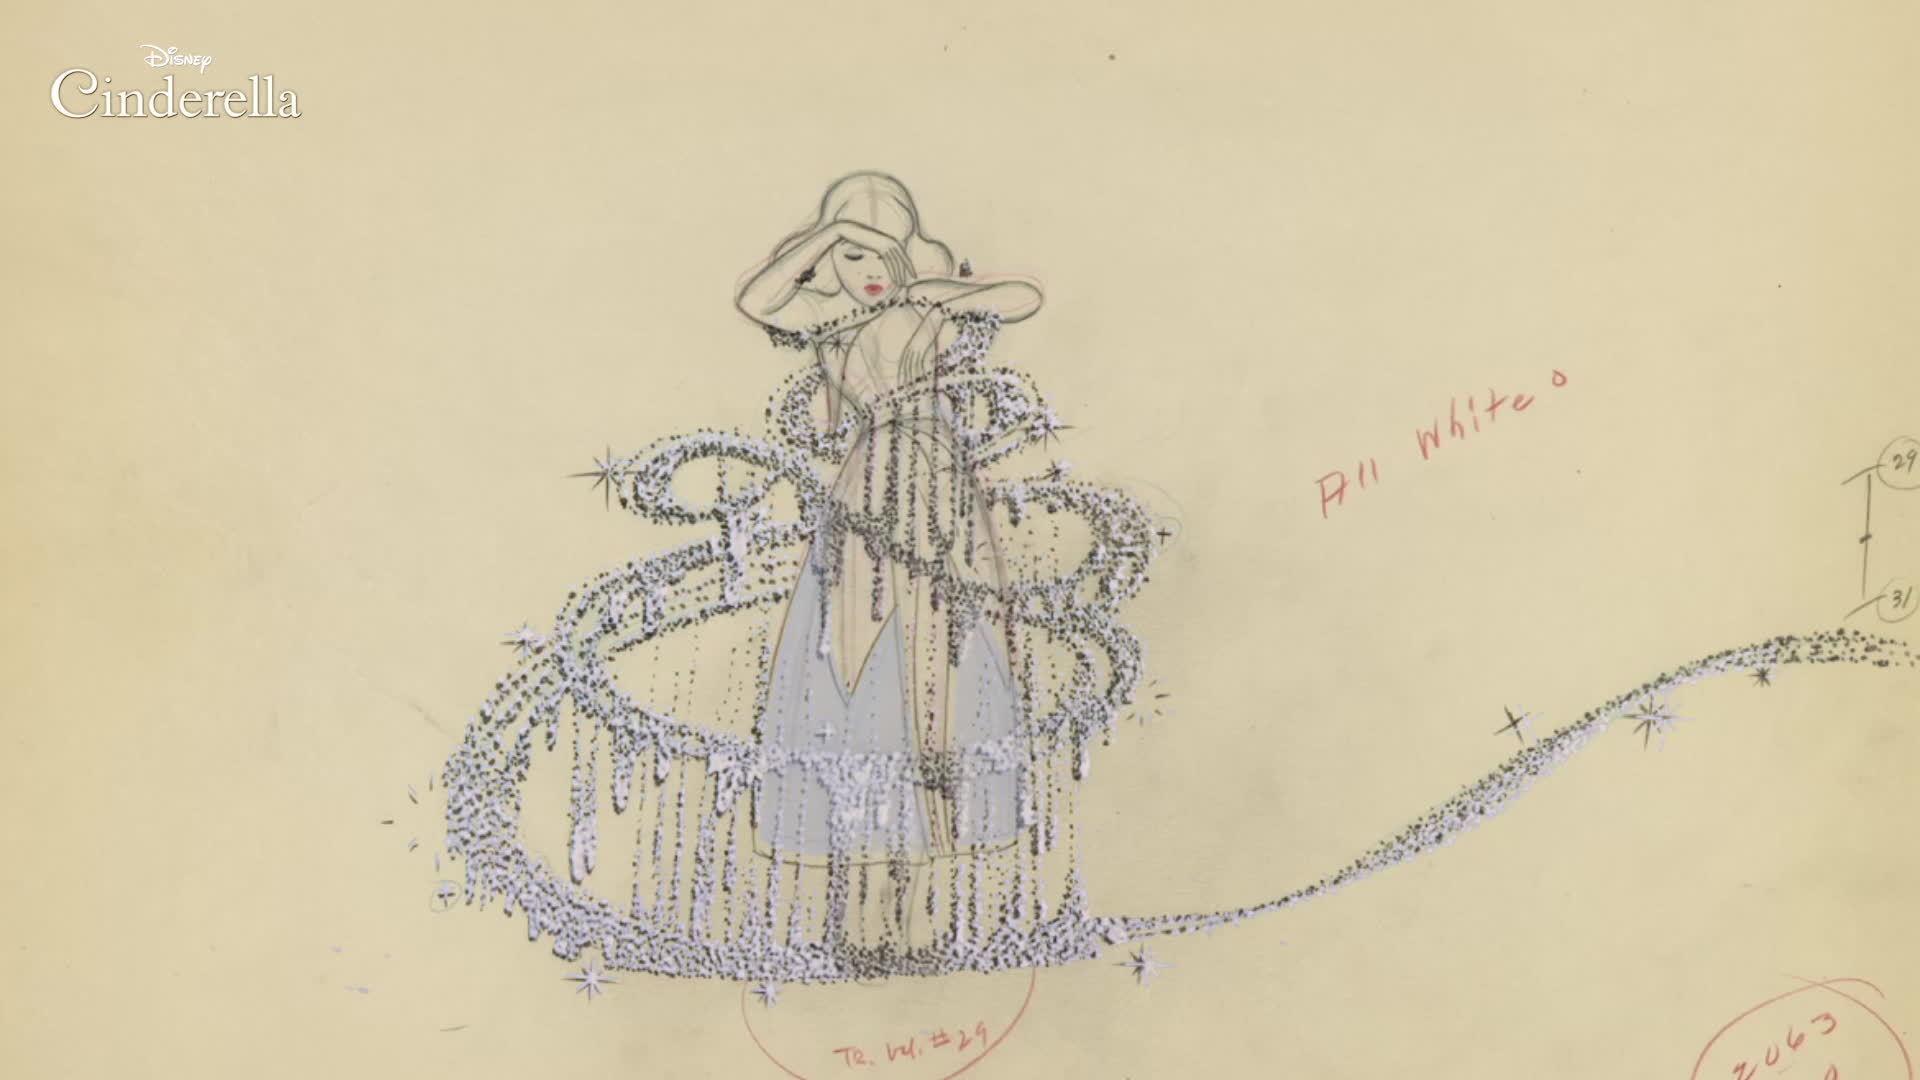 Cinderella Animation: Rough to Final